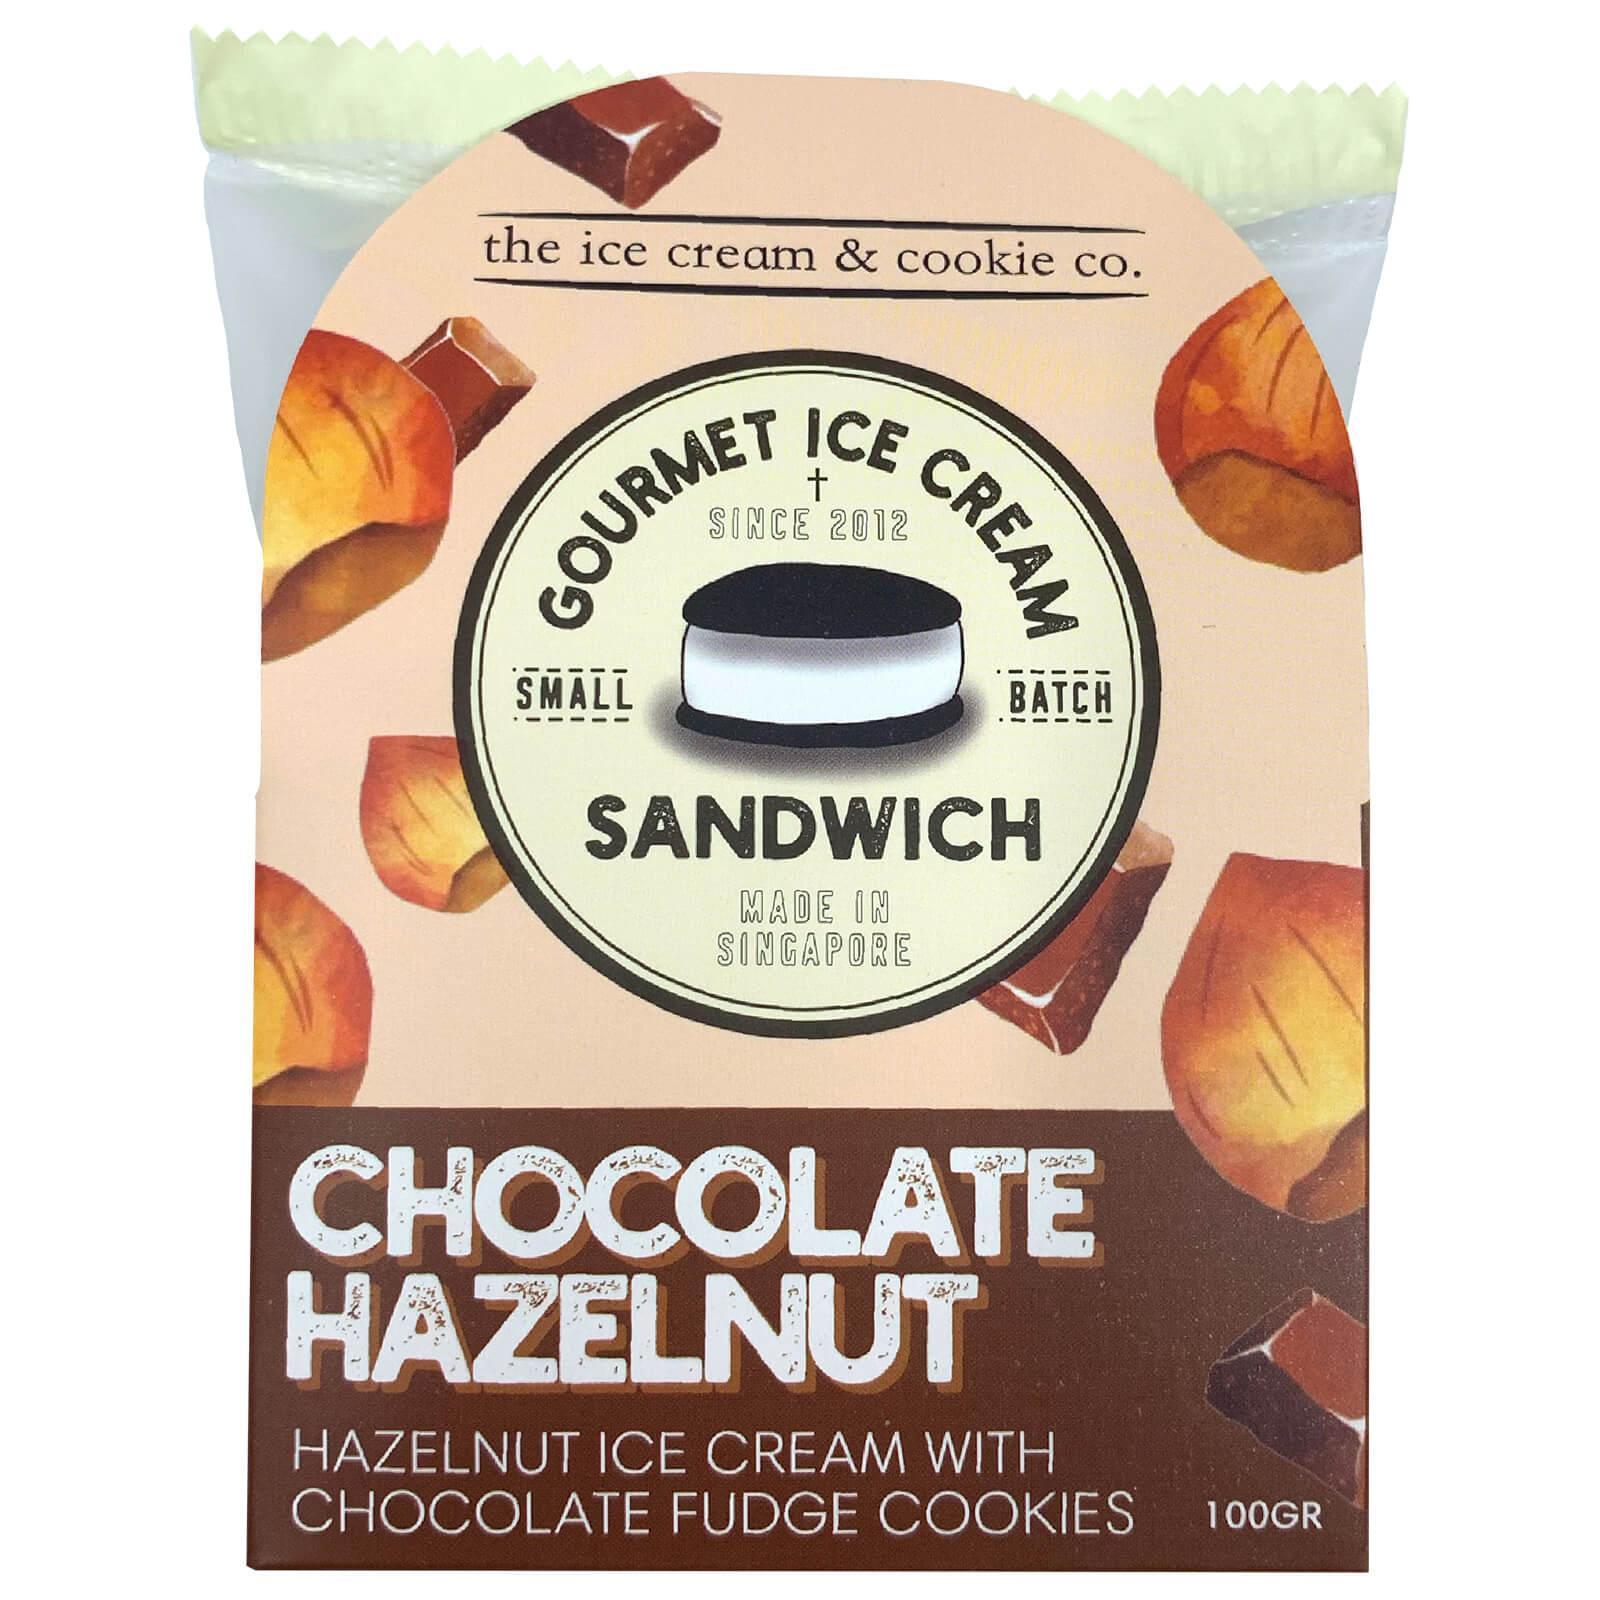 The Ice Cream & Cookie Co. Chocolate Hazelnut Gourmet Sandwich